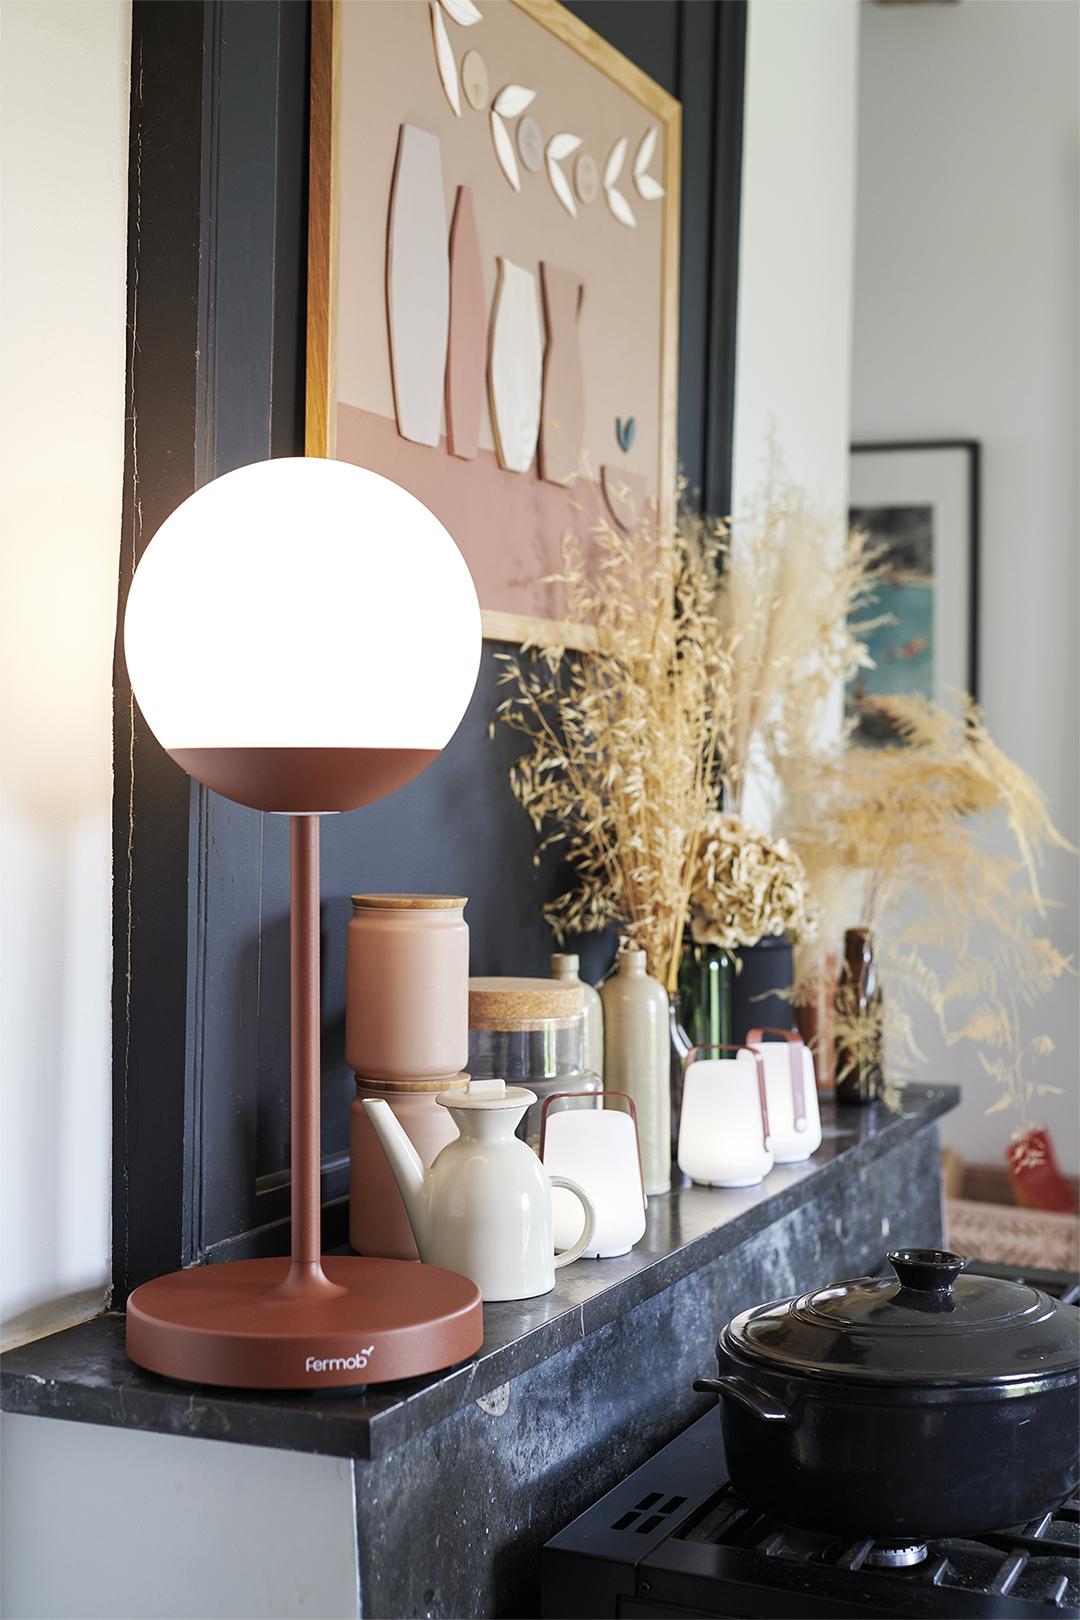 lampe à poser, lampe sans fil, luminaire exterieur, lampe de jardin, lampe bluetooth, wireless lamp